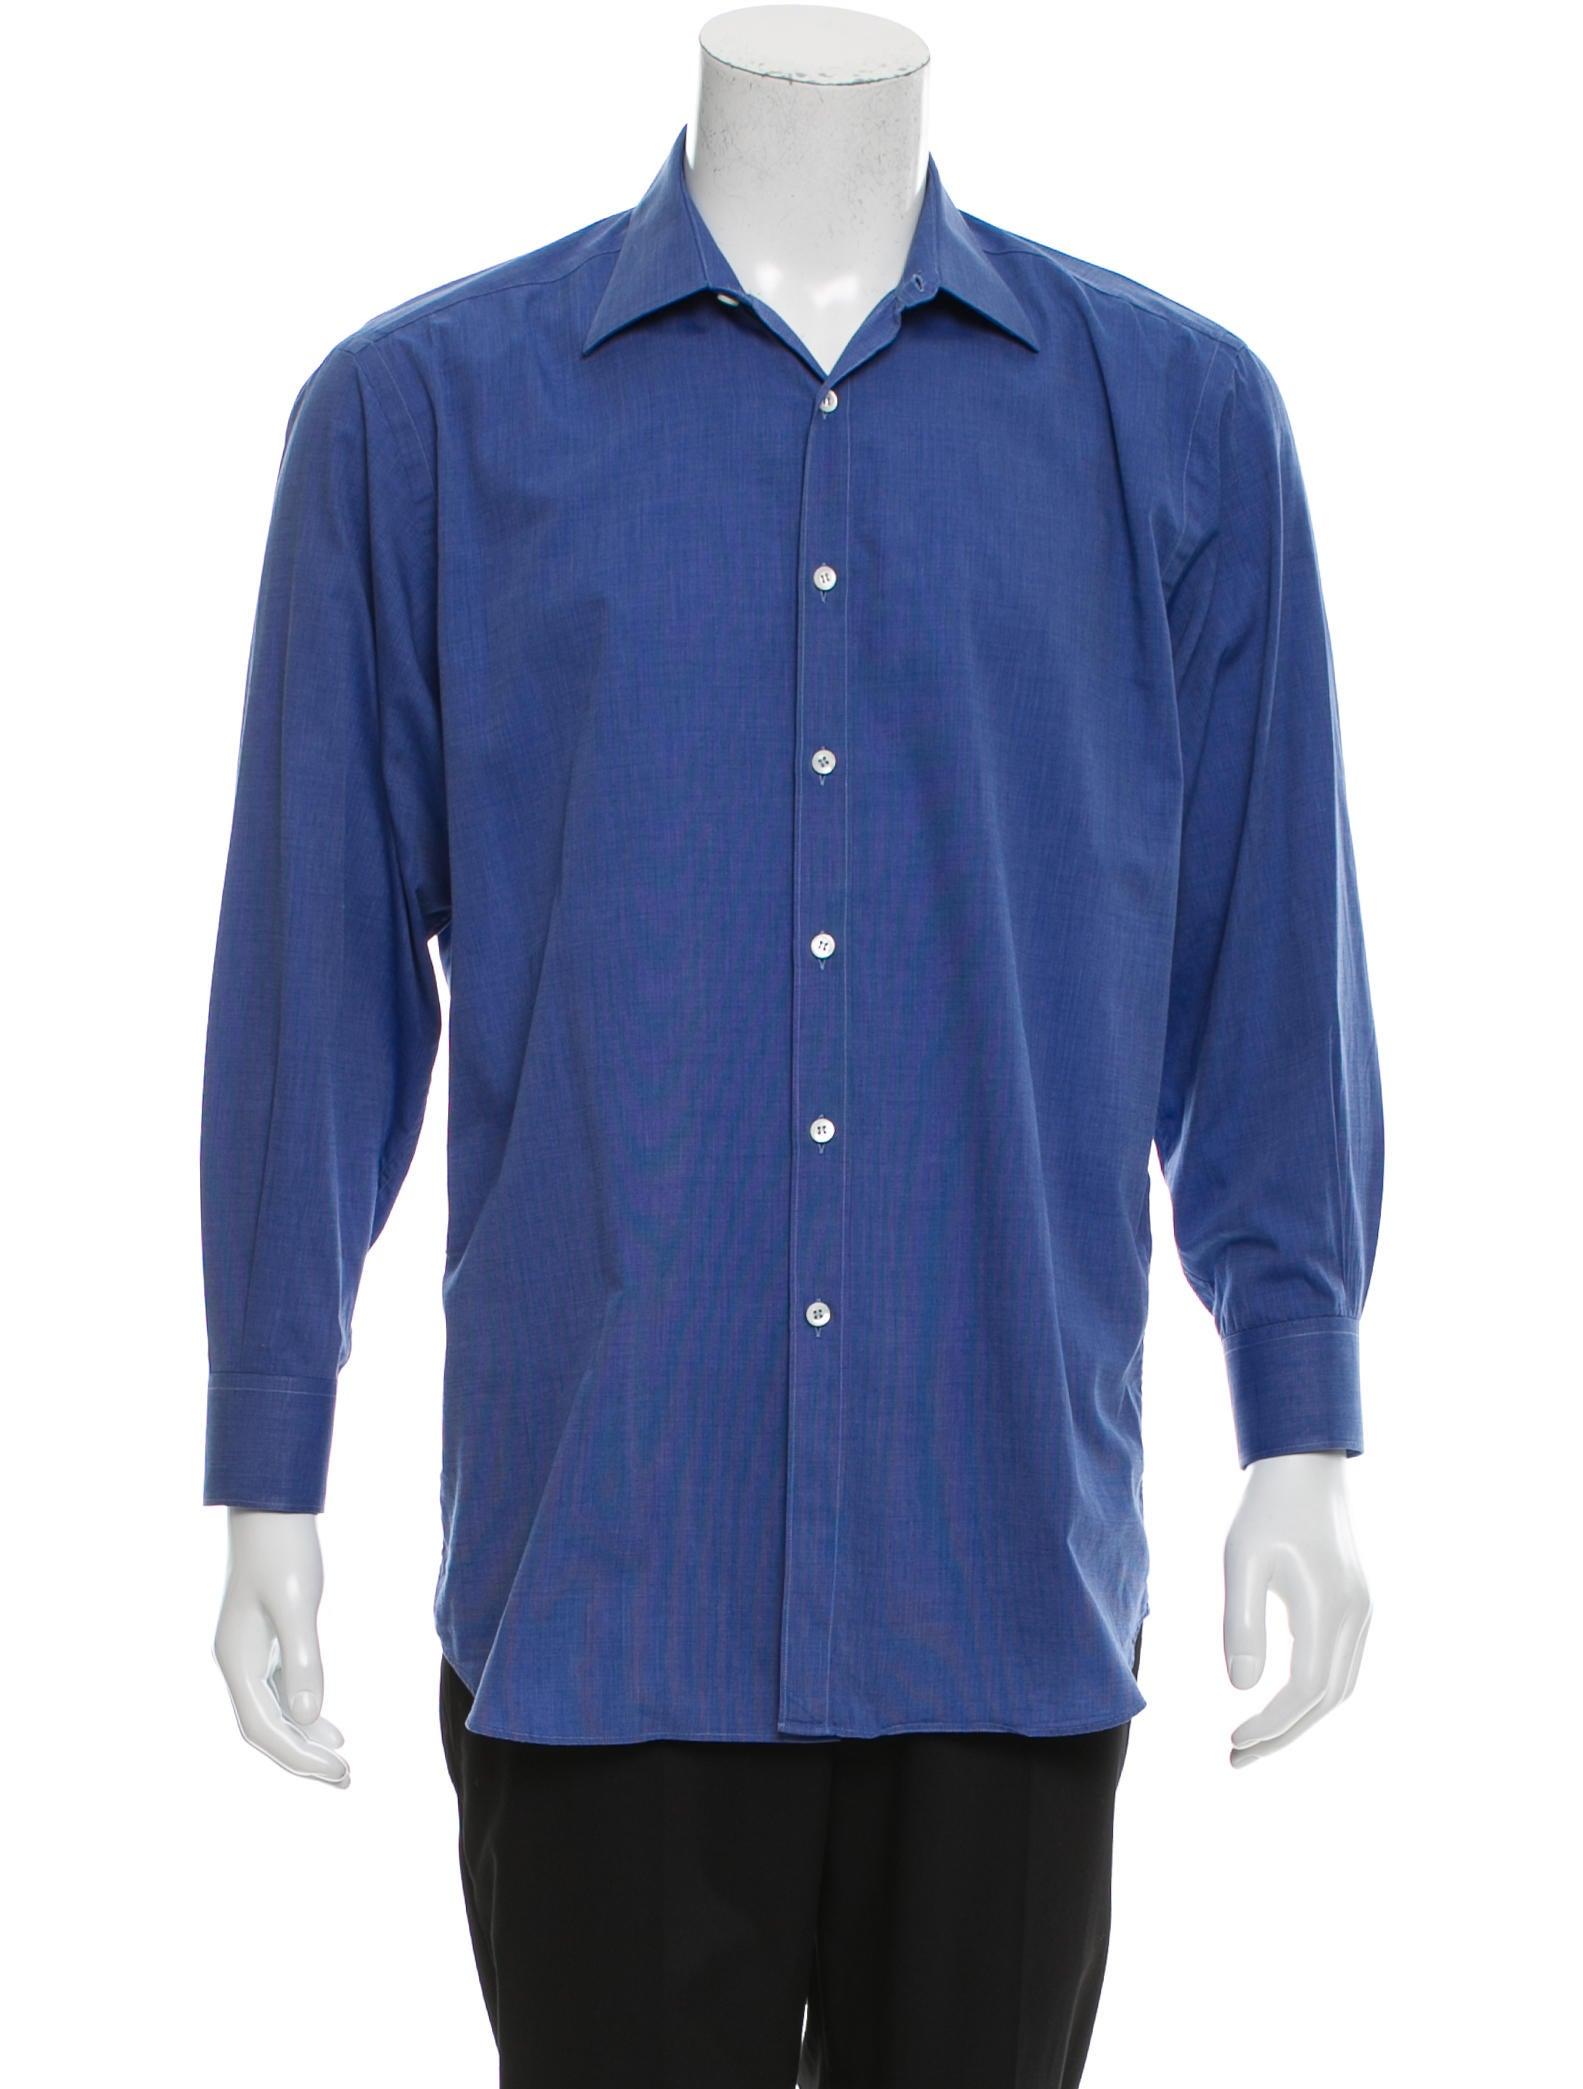 Prada Long Sleeve Button Up Shirt Clothing Pra146180